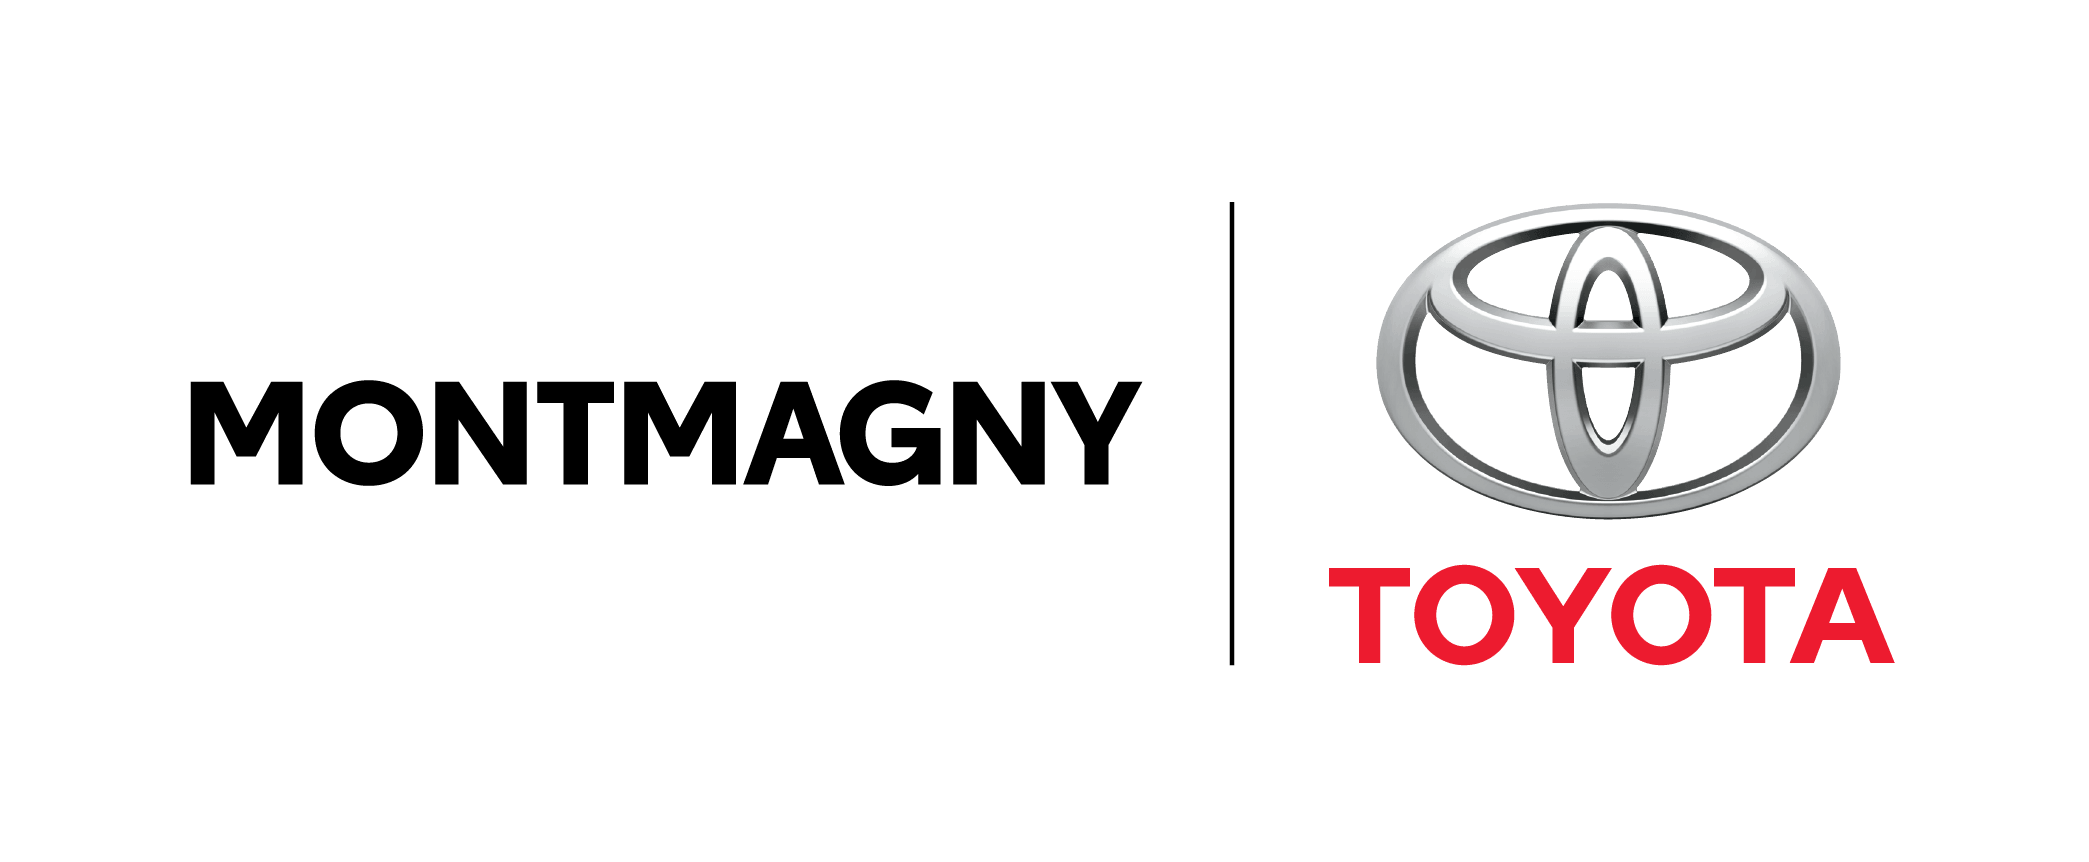 53184-Montmagny_Toyota_4COLOUR-002